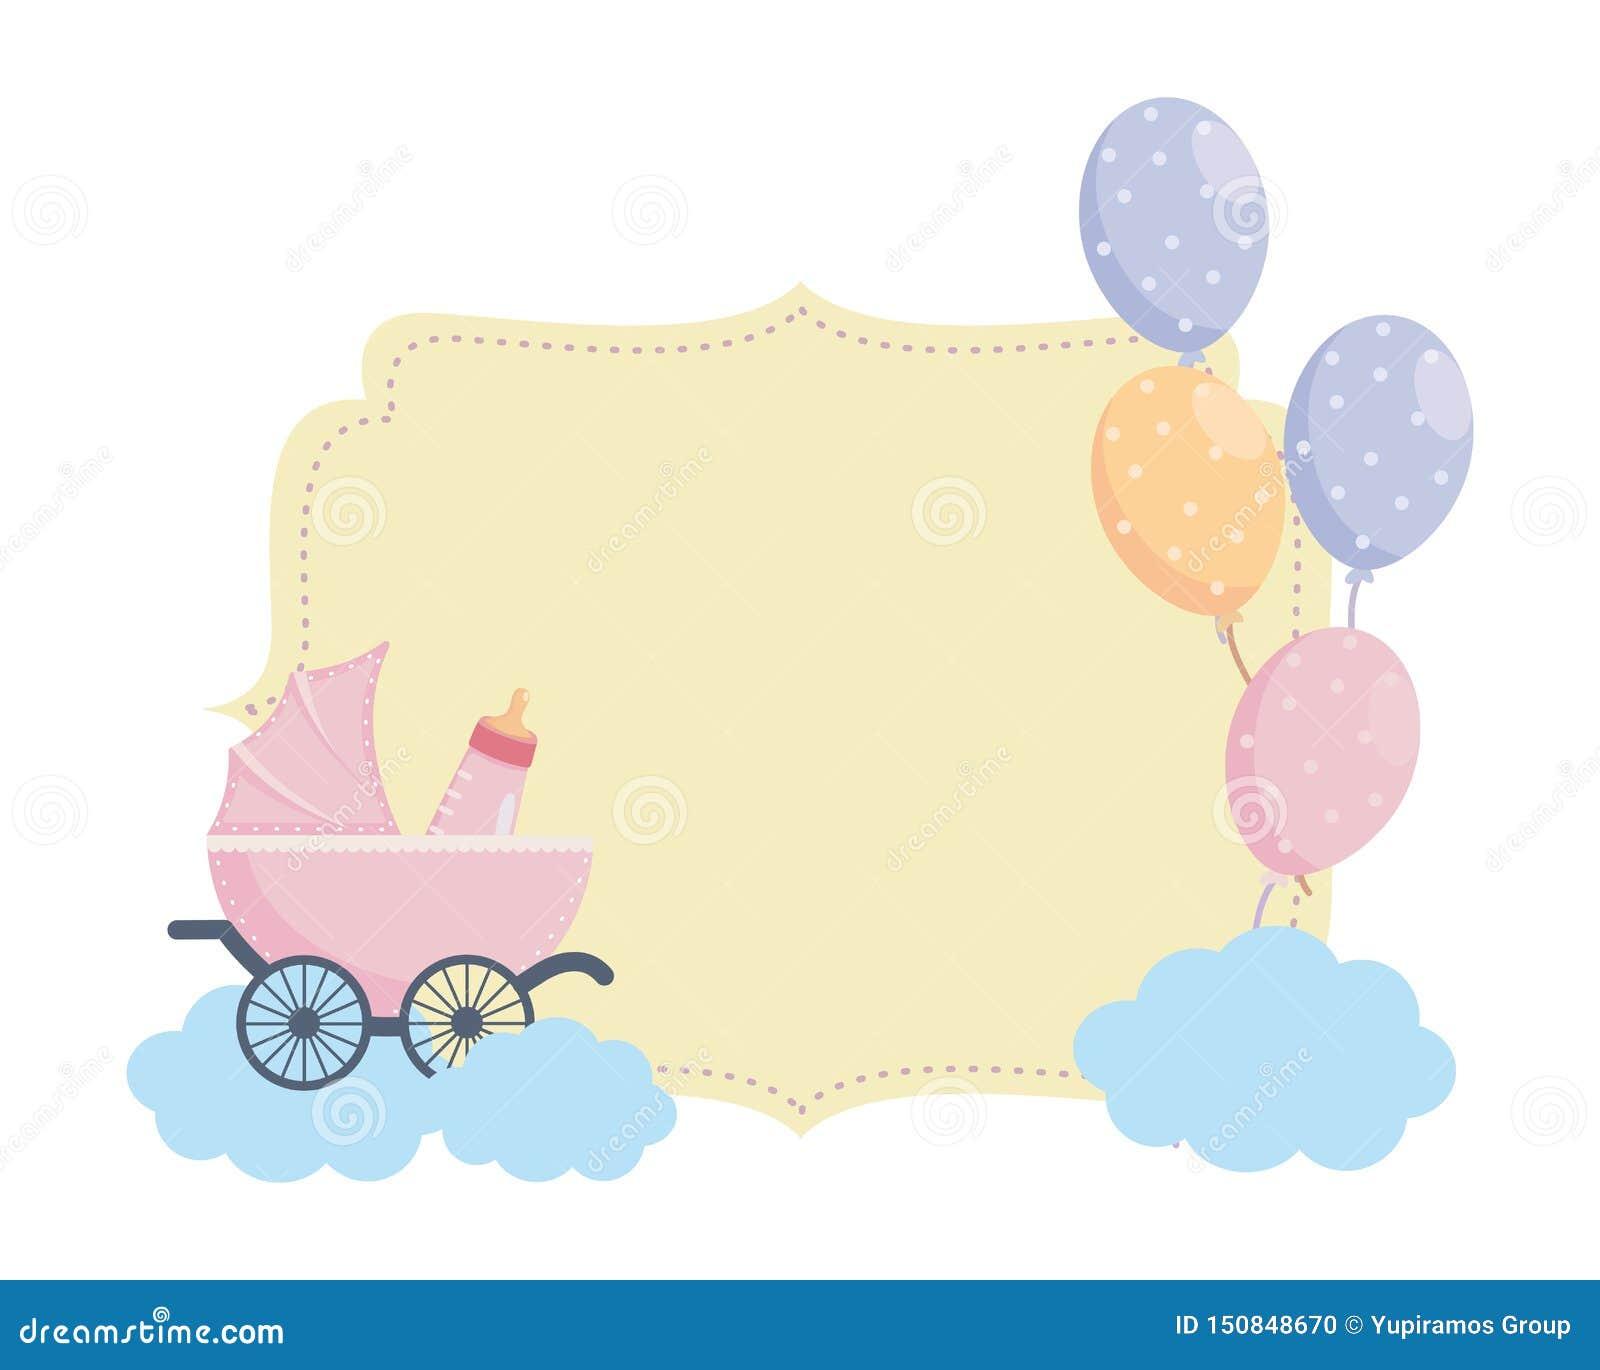 Isolated baby shower symbol design